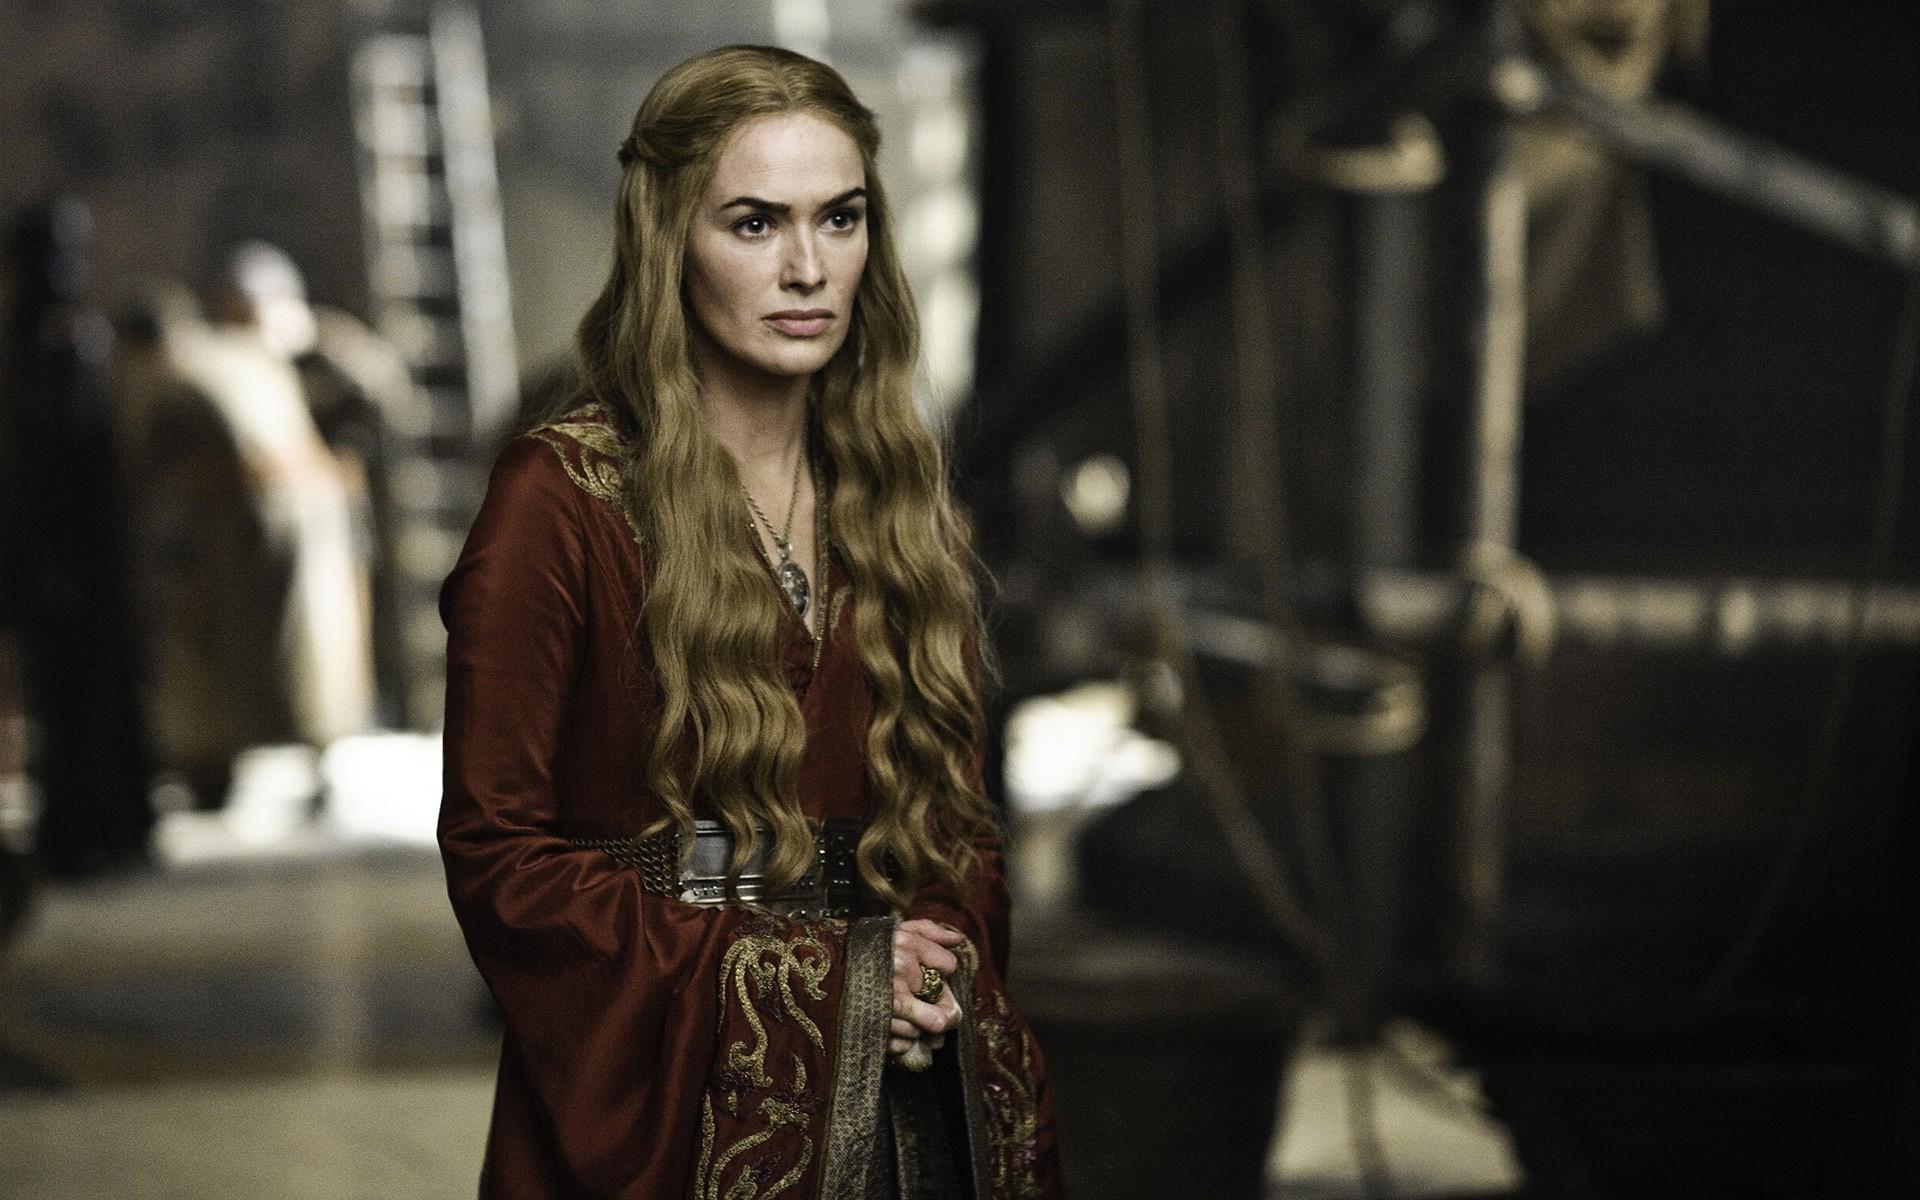 Lena-Headey-Game-Of-Thrones2